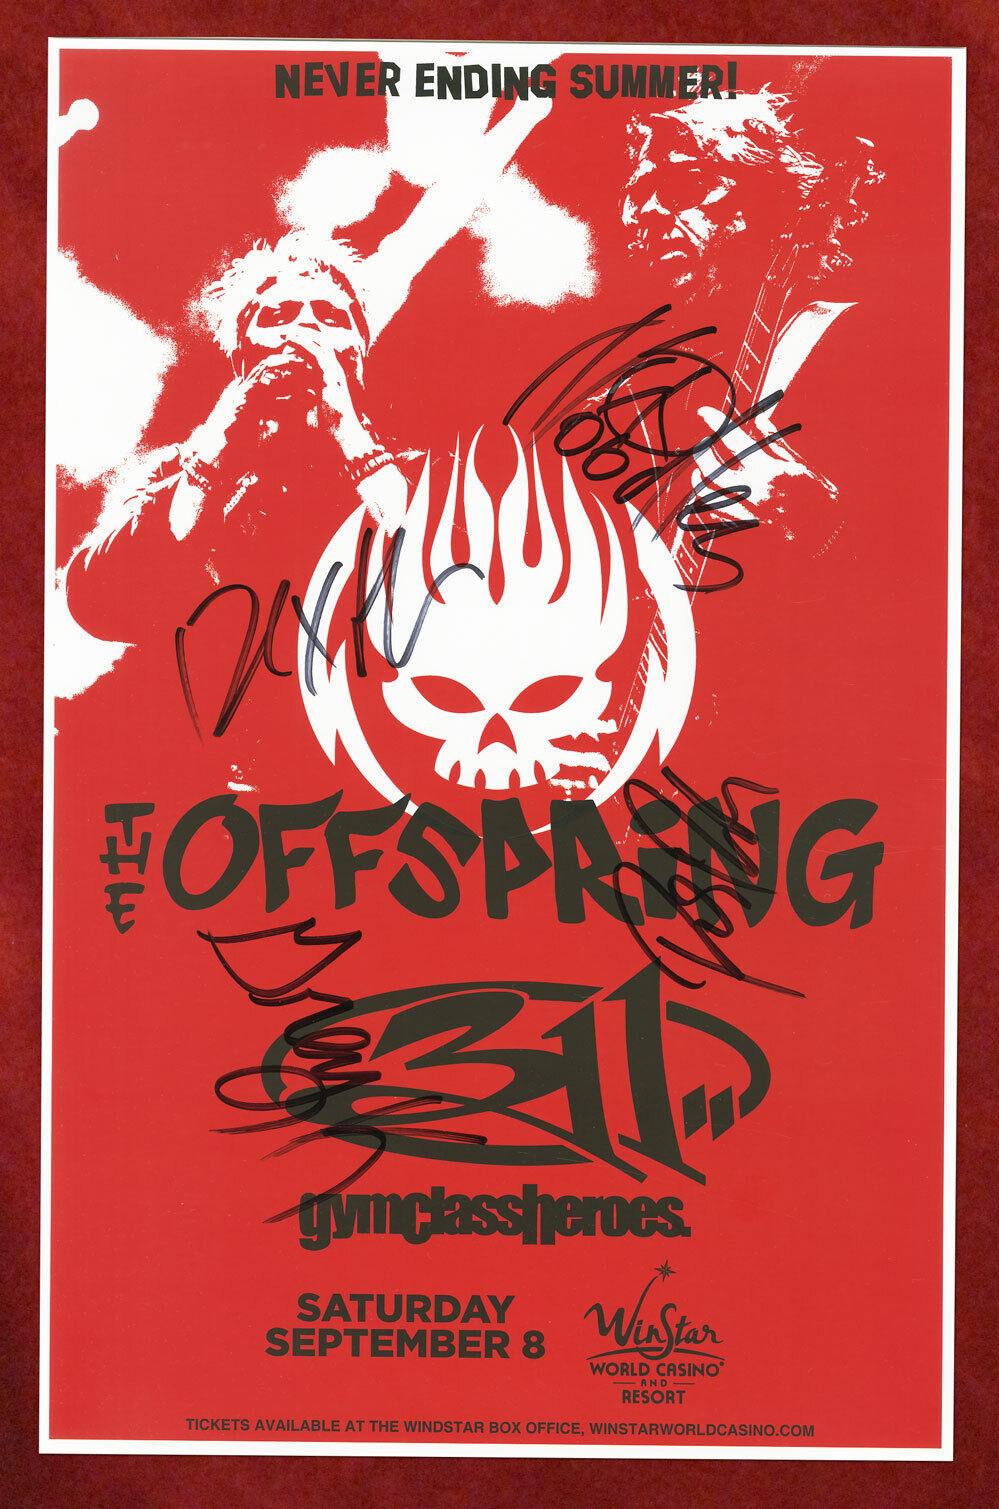 The Offspring Autographed Concert Poster 2018 Pete Parada, Noodles, Greg Kriesel - $47.00